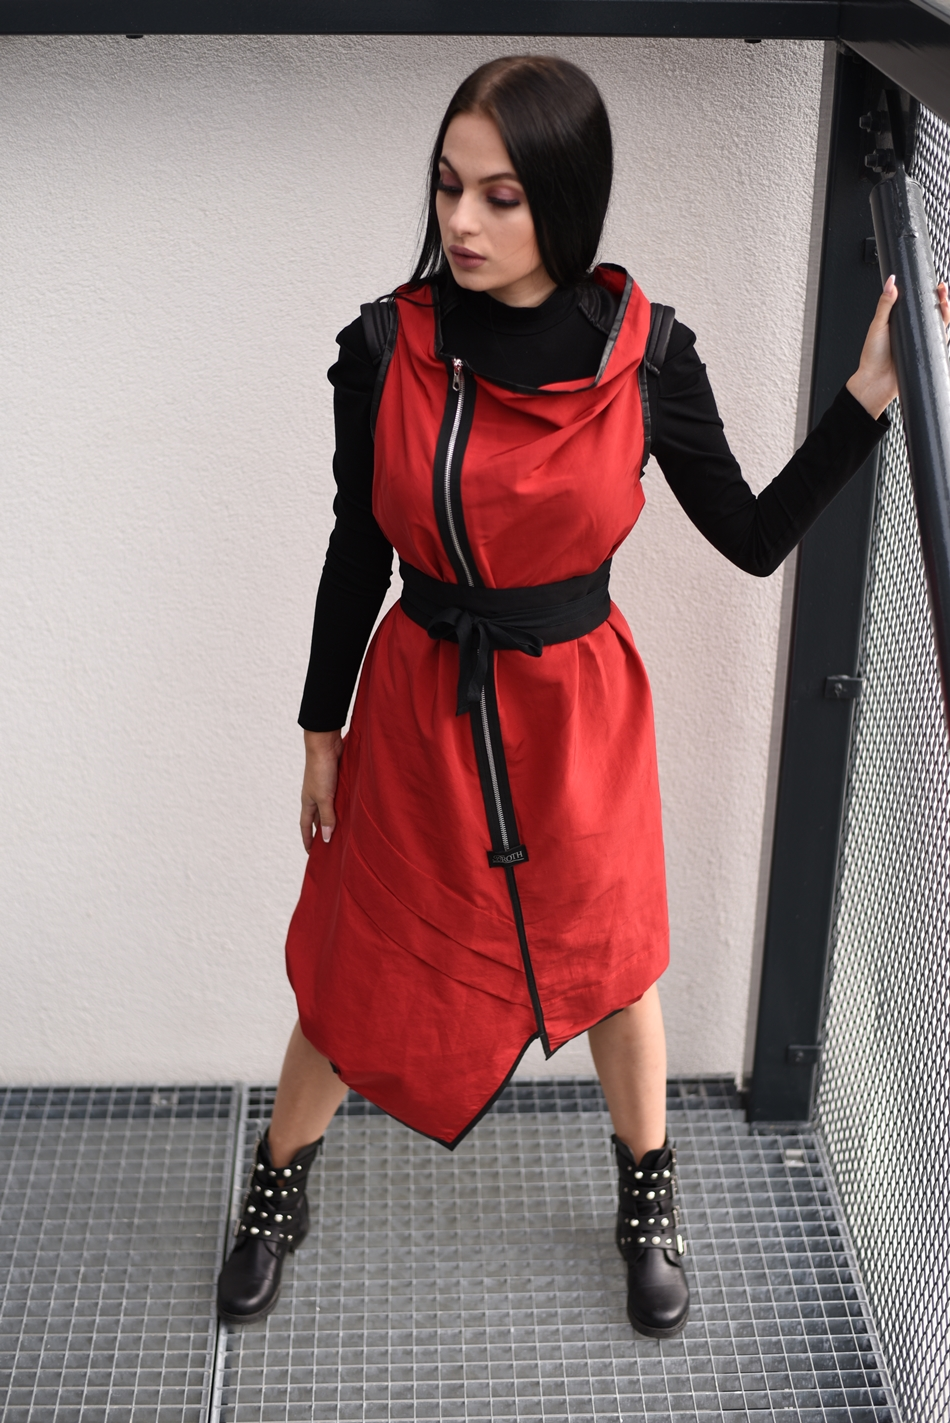 Broth_design_clothes_036